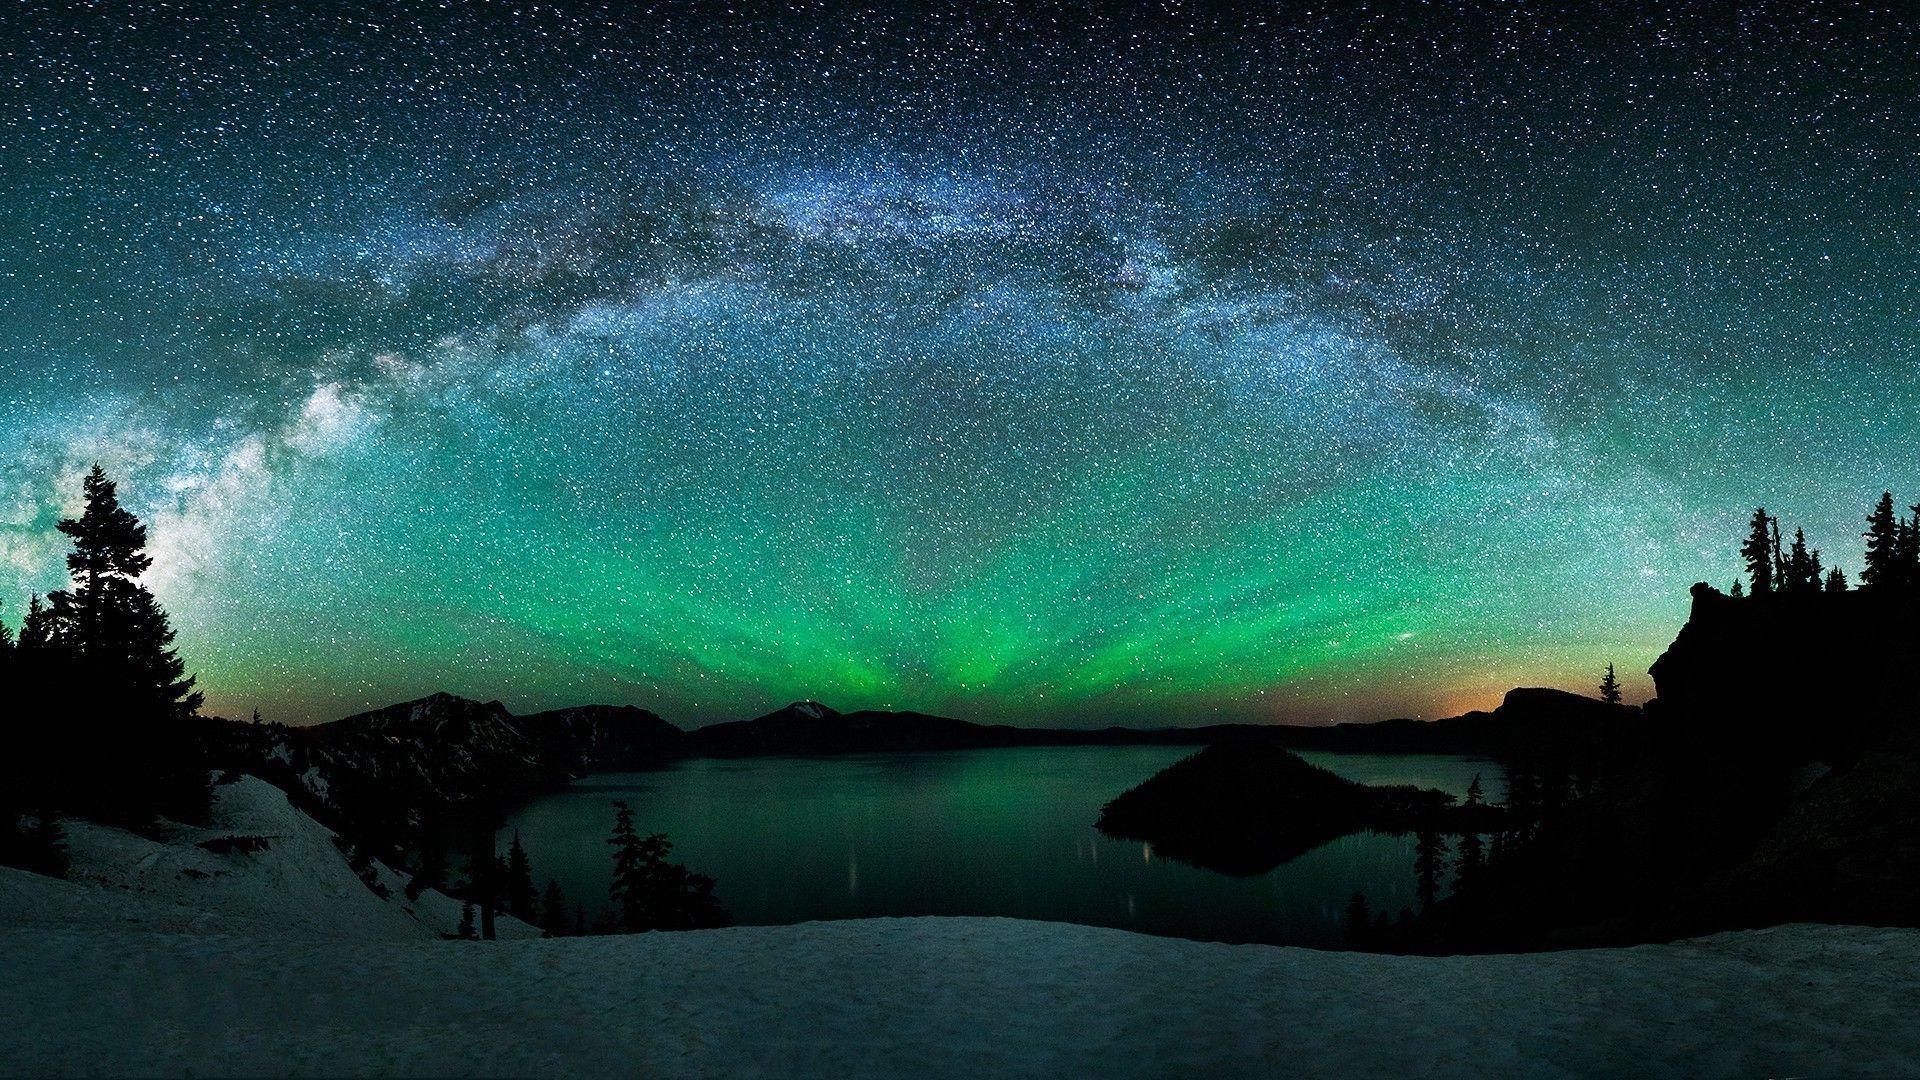 Milky Way Aurora Borealis Photo Widescreen 2 HD Wallpapers | aladdino.